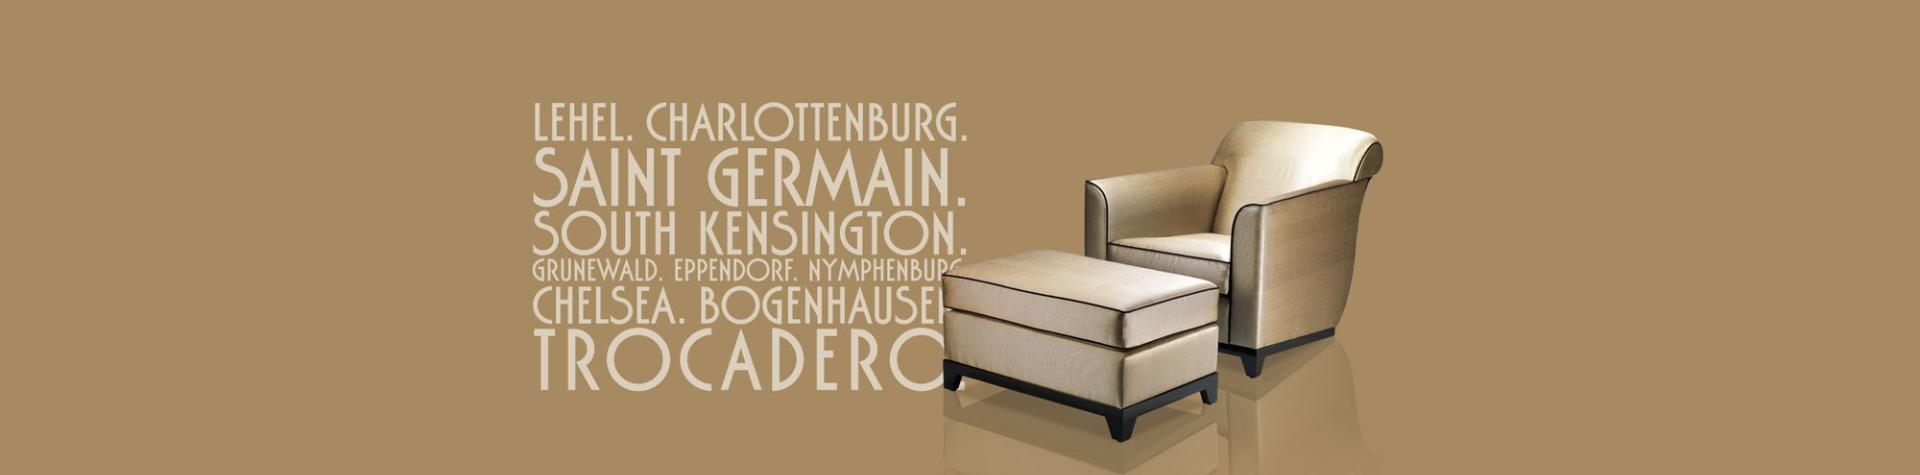 gold-lehel-charlottenburg